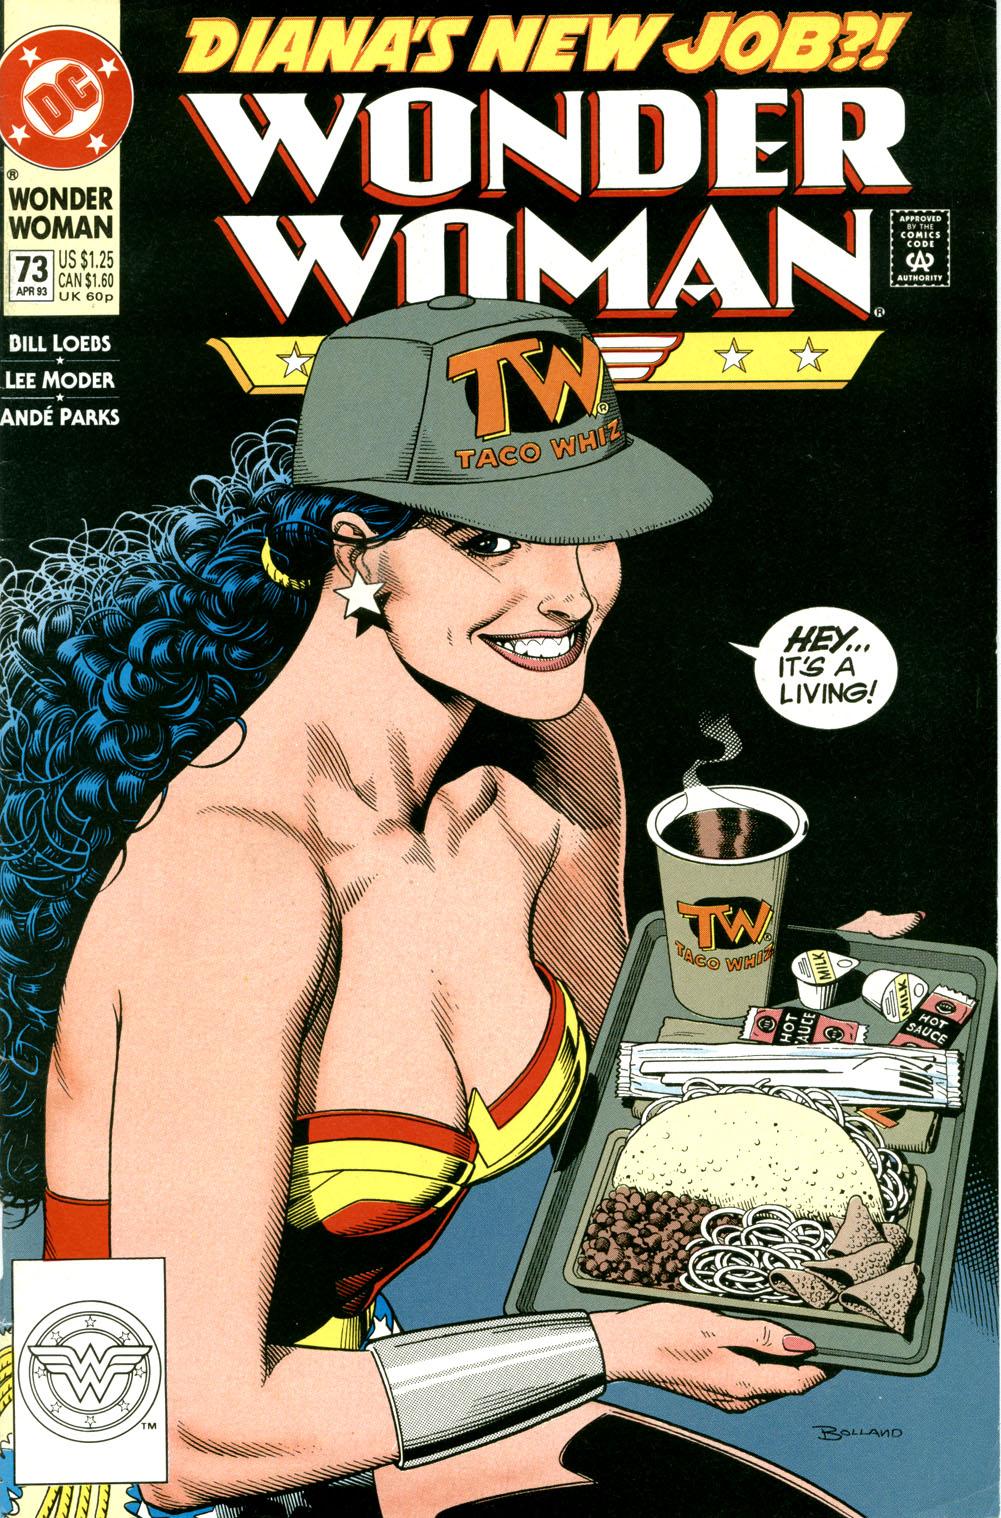 Read online Wonder Woman (1987) comic -  Issue #73 - 2